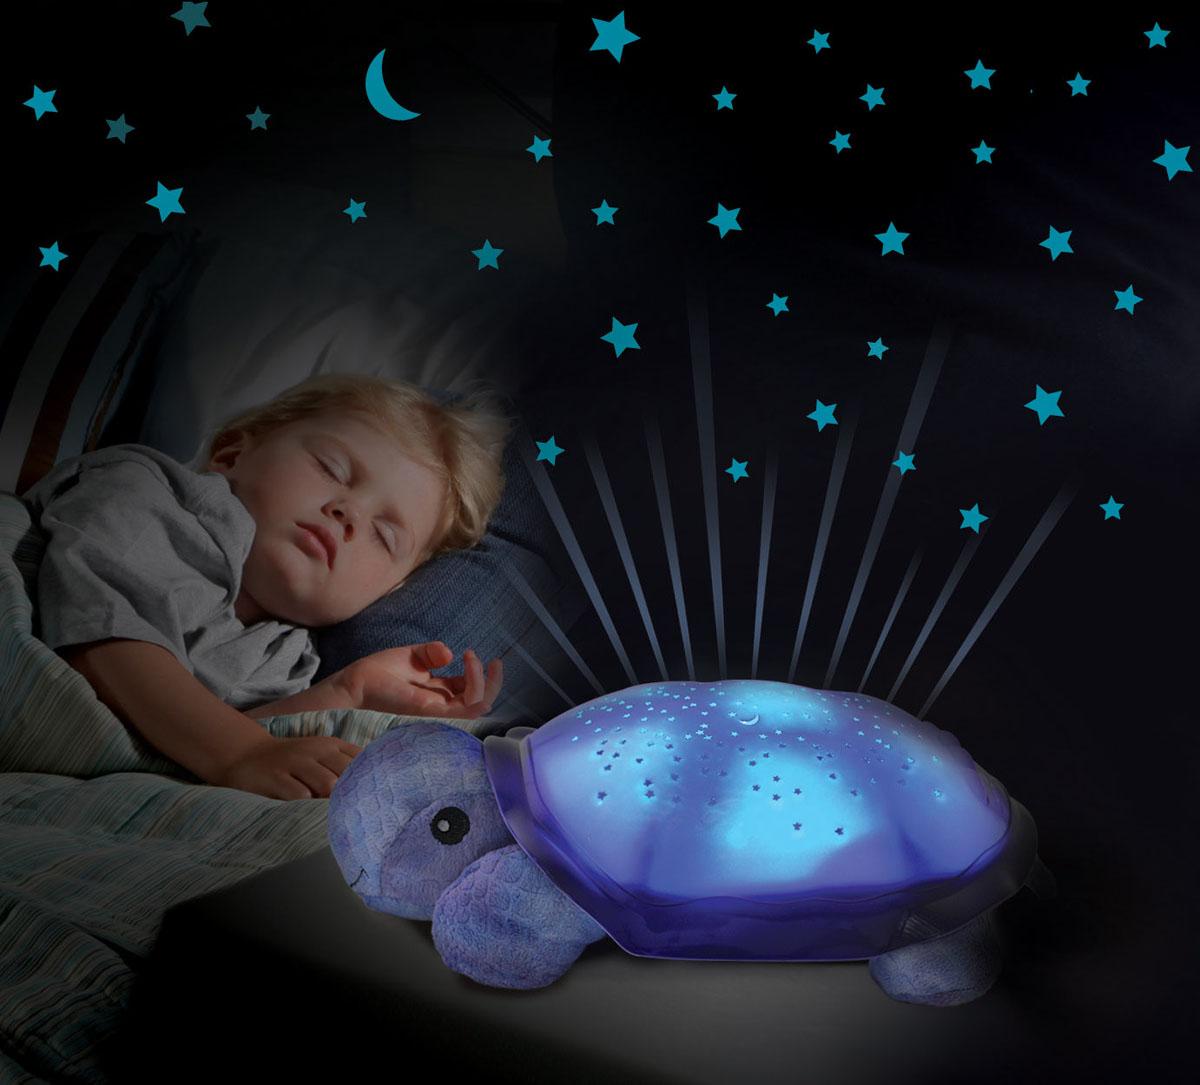 Ночник для ребенка своими руками фото